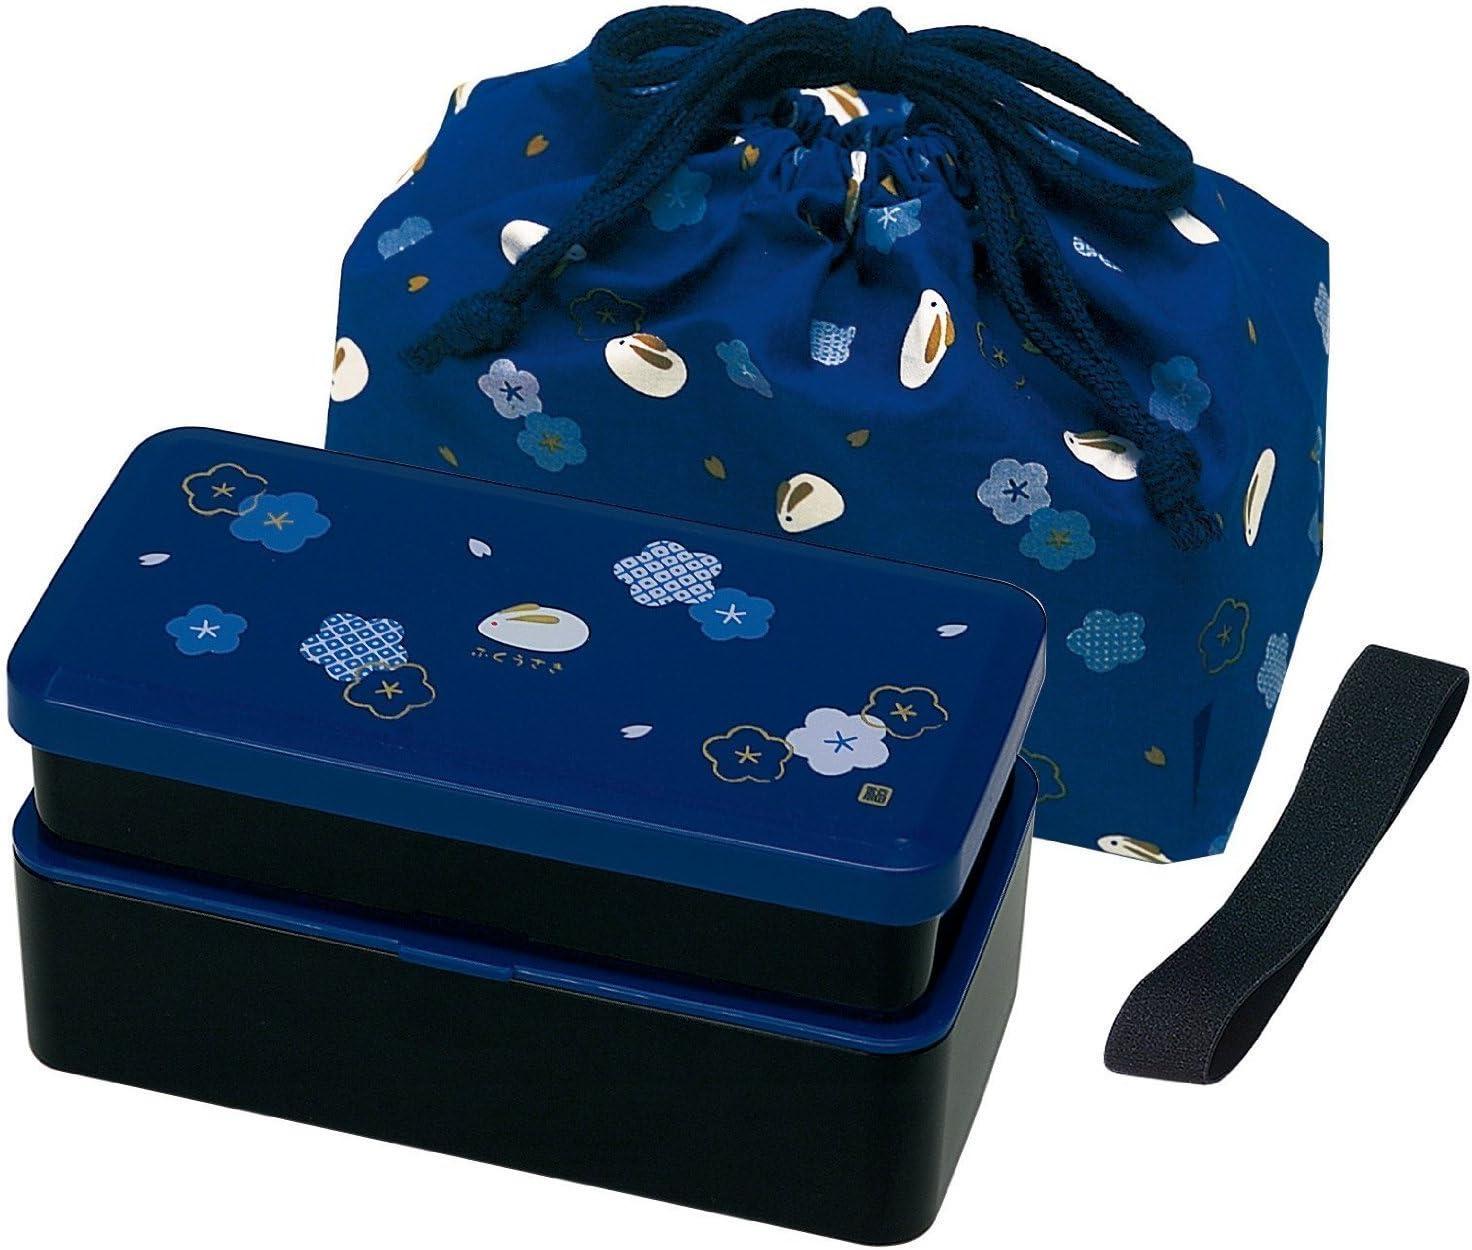 Japanese Traditional Rabbit Blossom Bento Box Set - Square 2 Tier Bento Box, Rice Ball Press, Bento Bag (Blue) by Skater: Amazon.es: Hogar